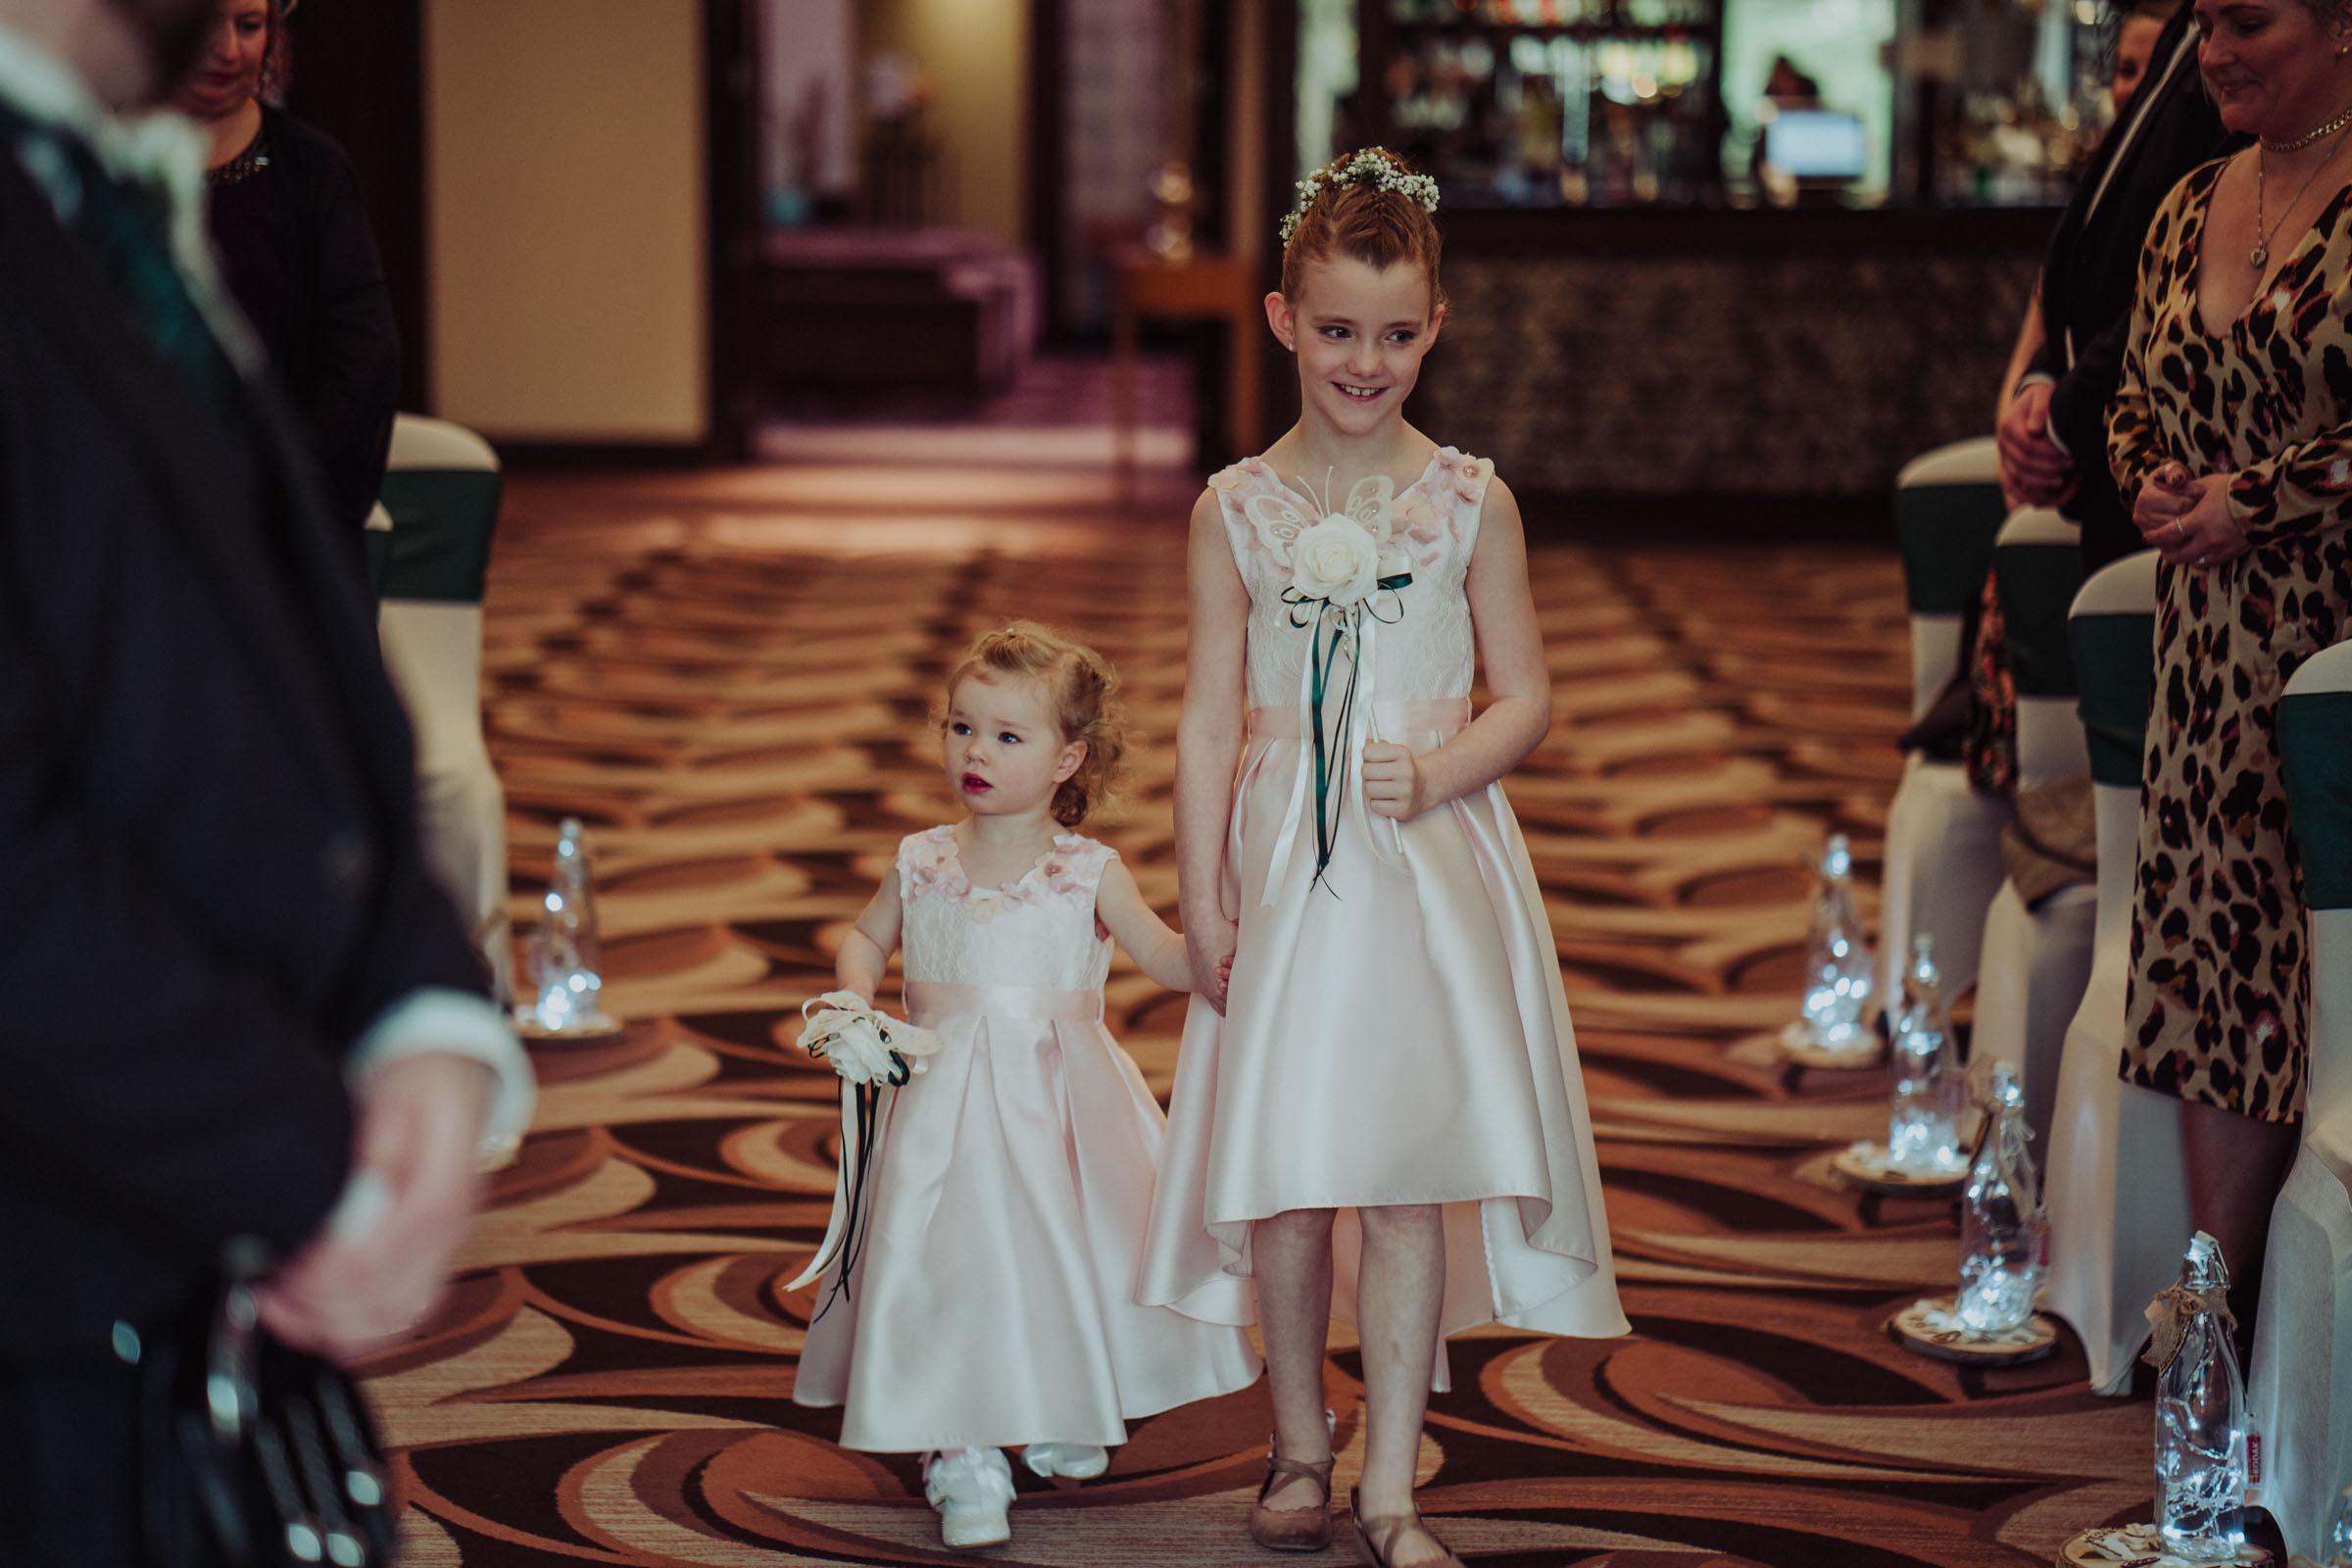 Radstone-Wedding-Dearly-Photography-Scotland (8 of 50).jpg